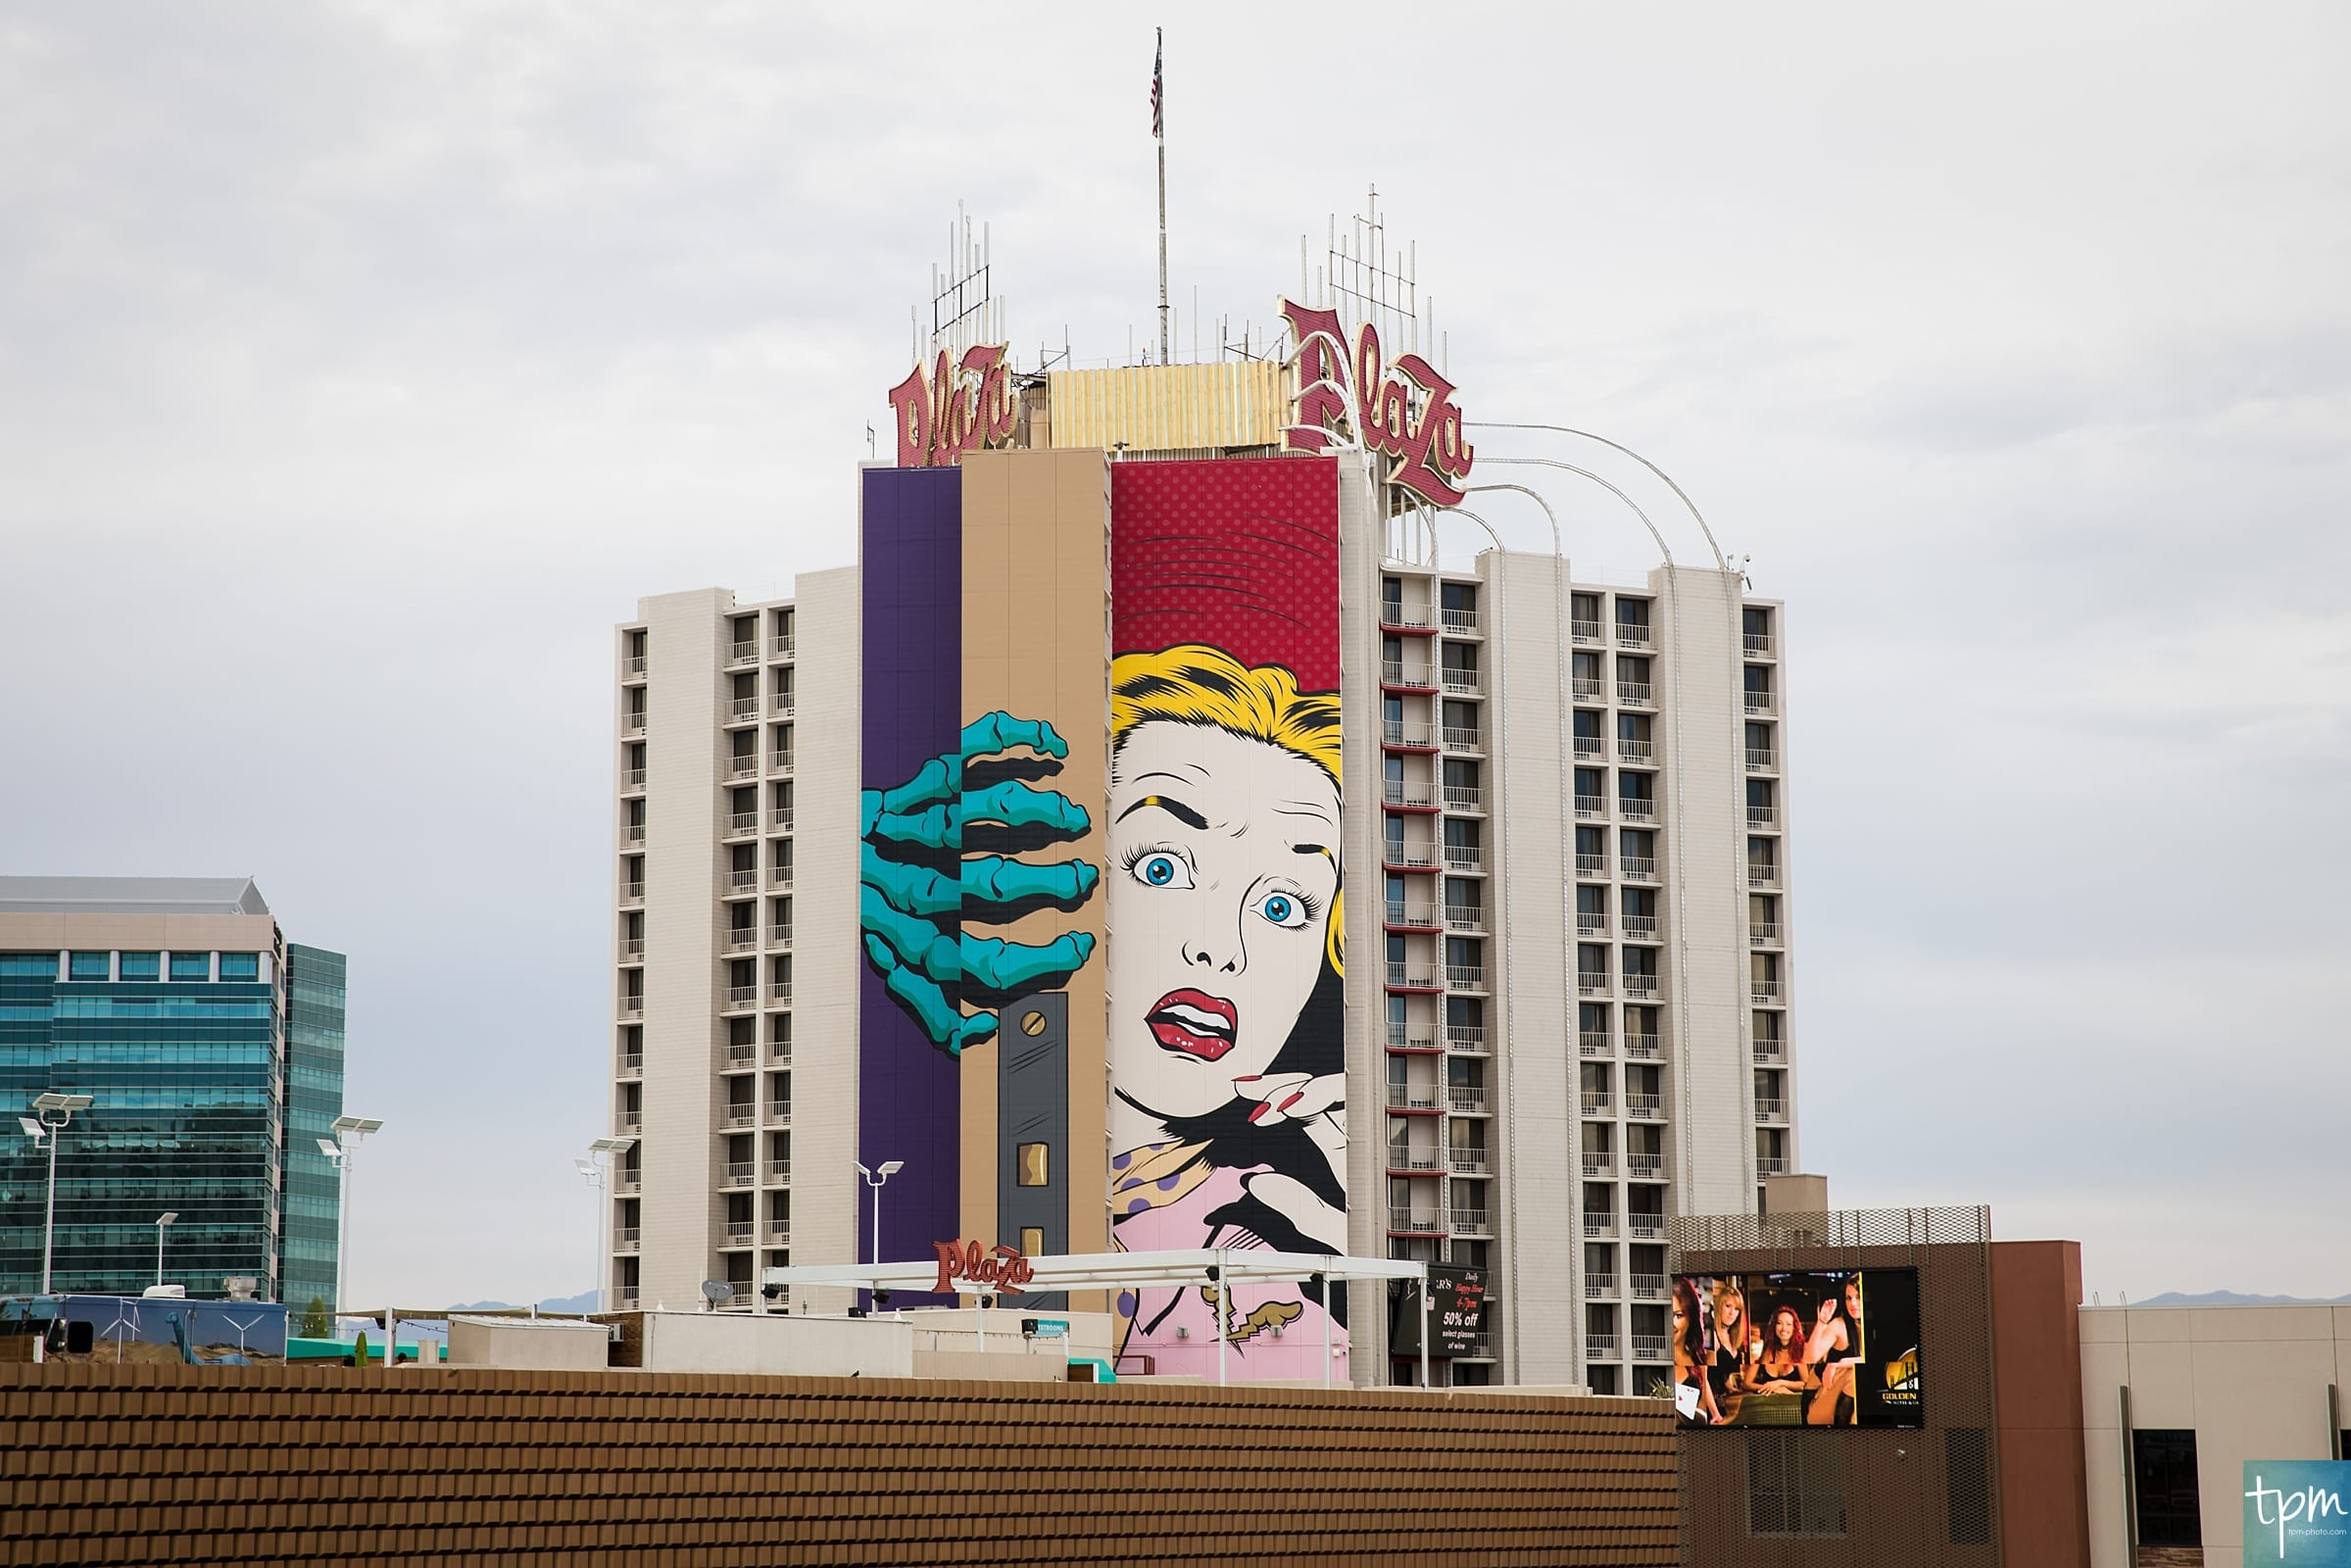 D*Face, Plaza Hotel, Taylored Photo Memories, Las Vegas Murals